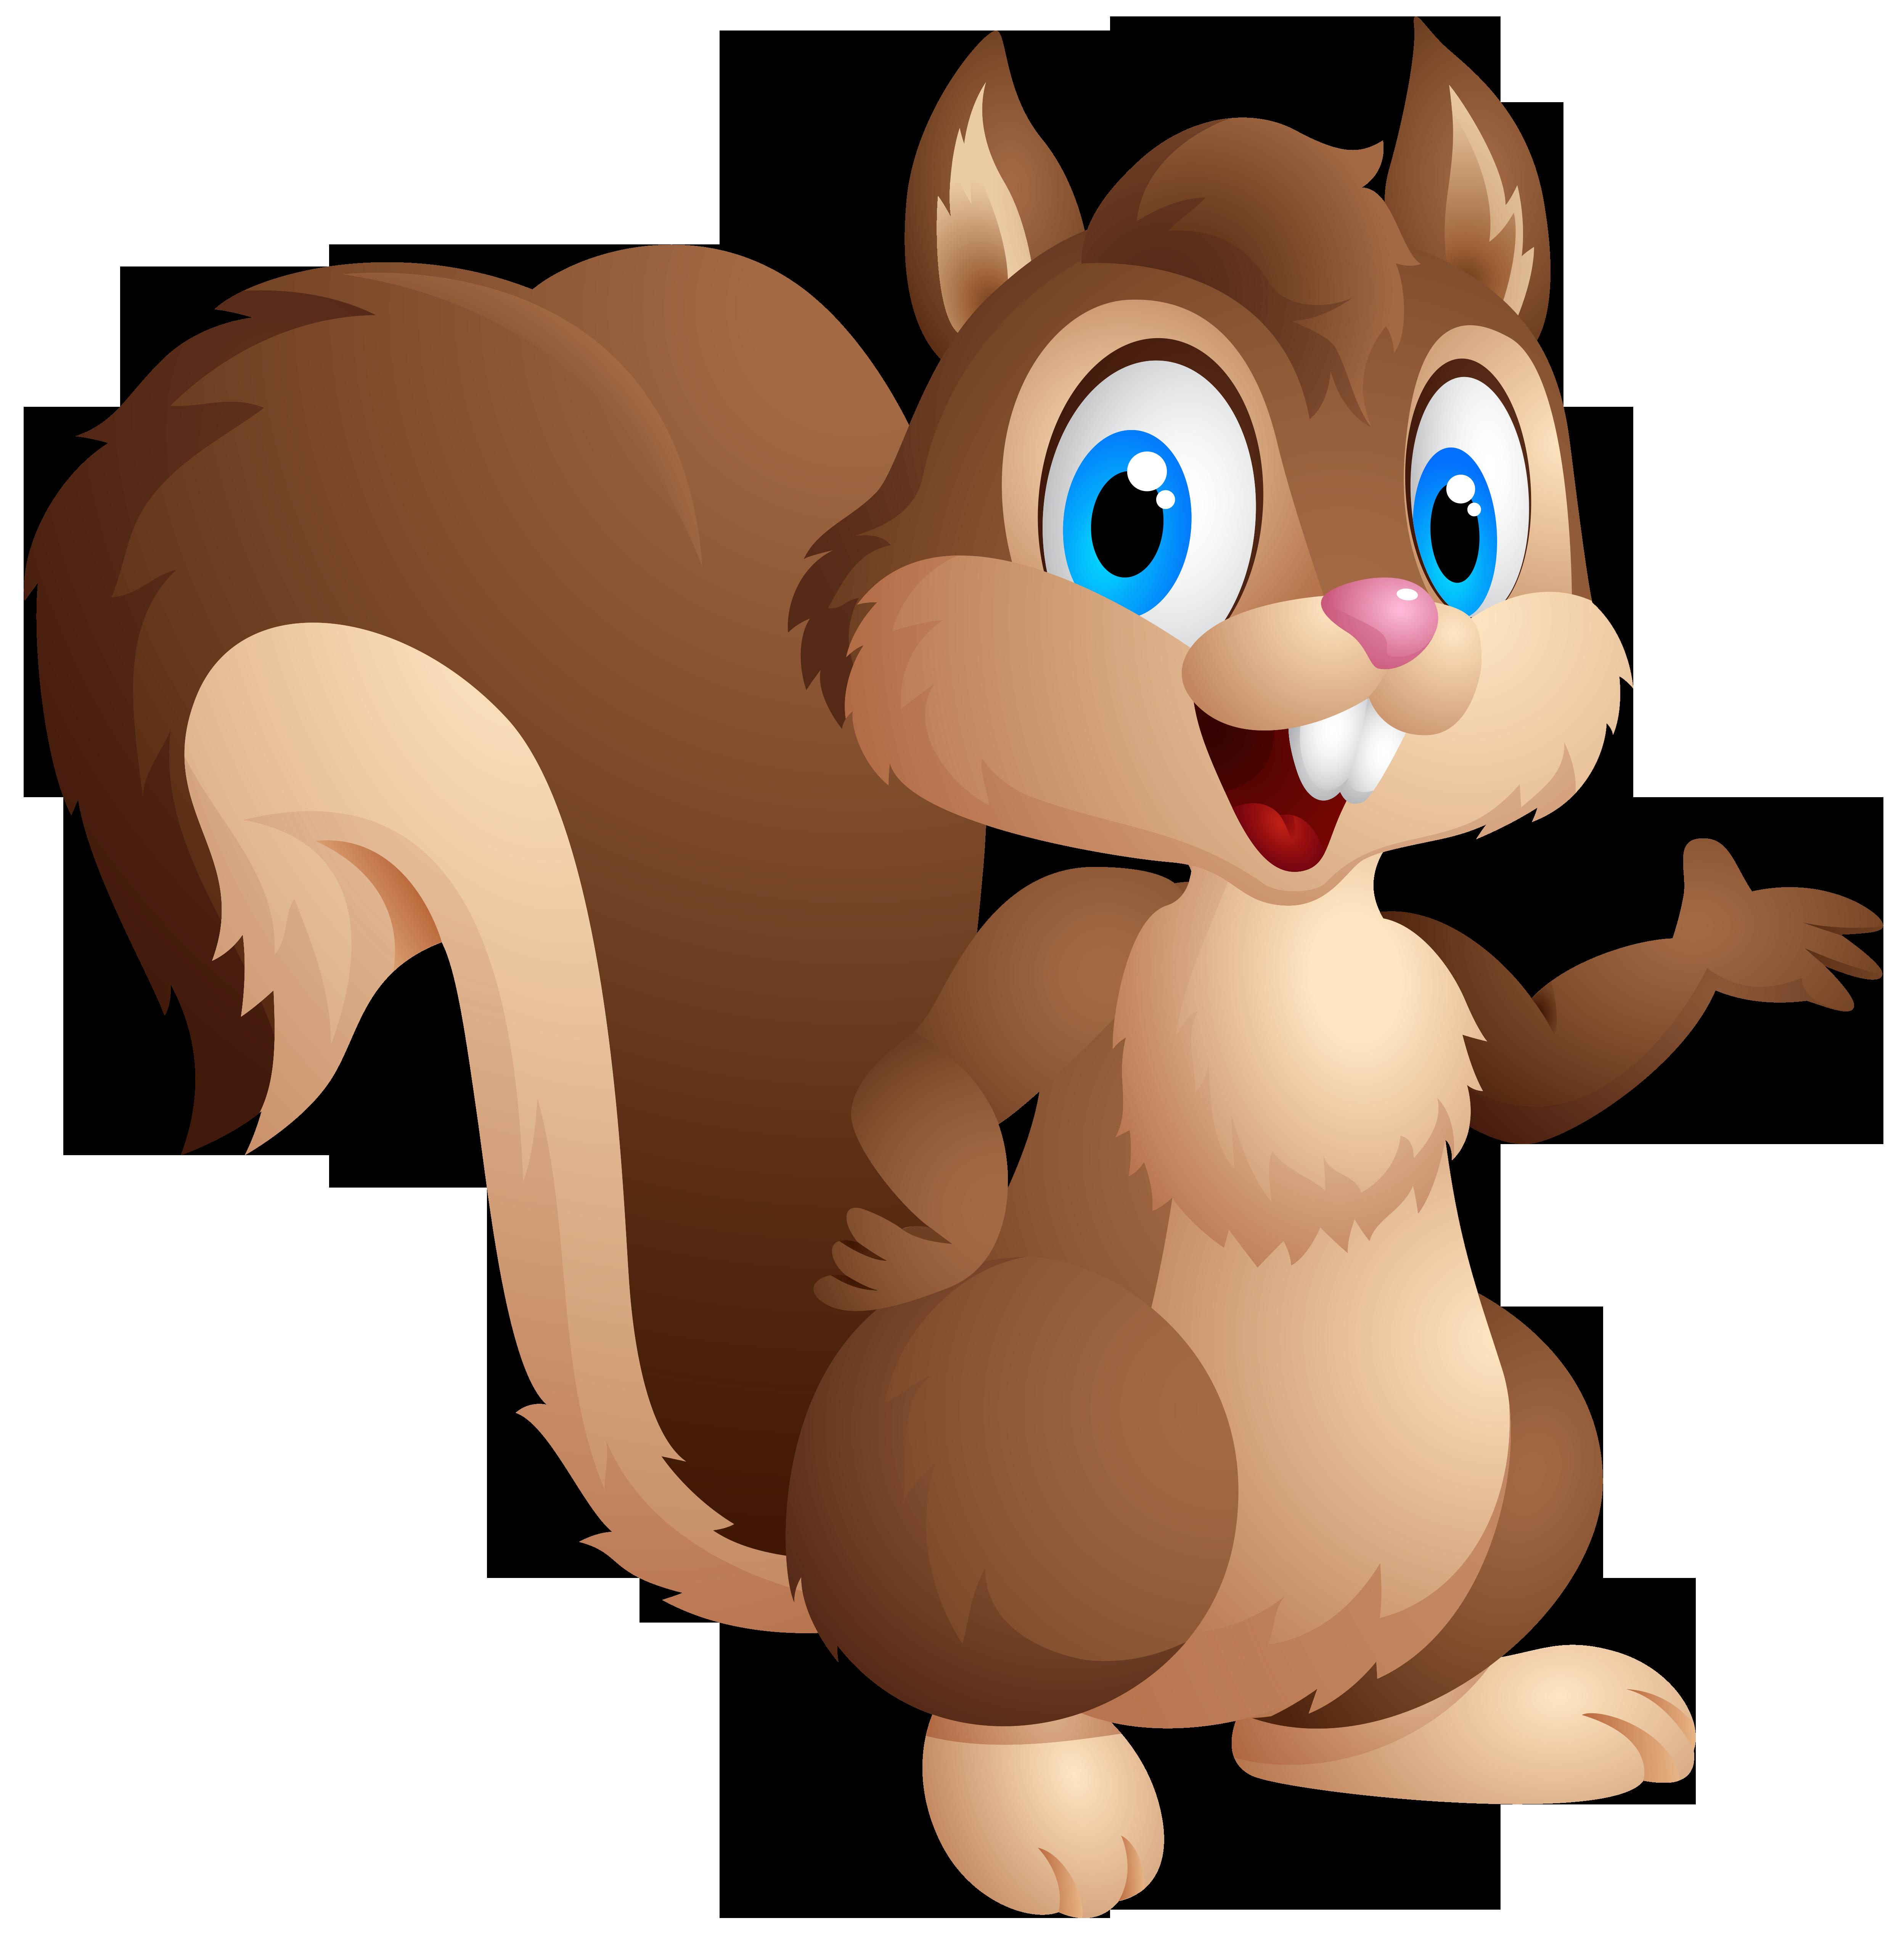 Download Gray Squirrel Cute Chipmunk Eastern Cartoon Clipart PNG.